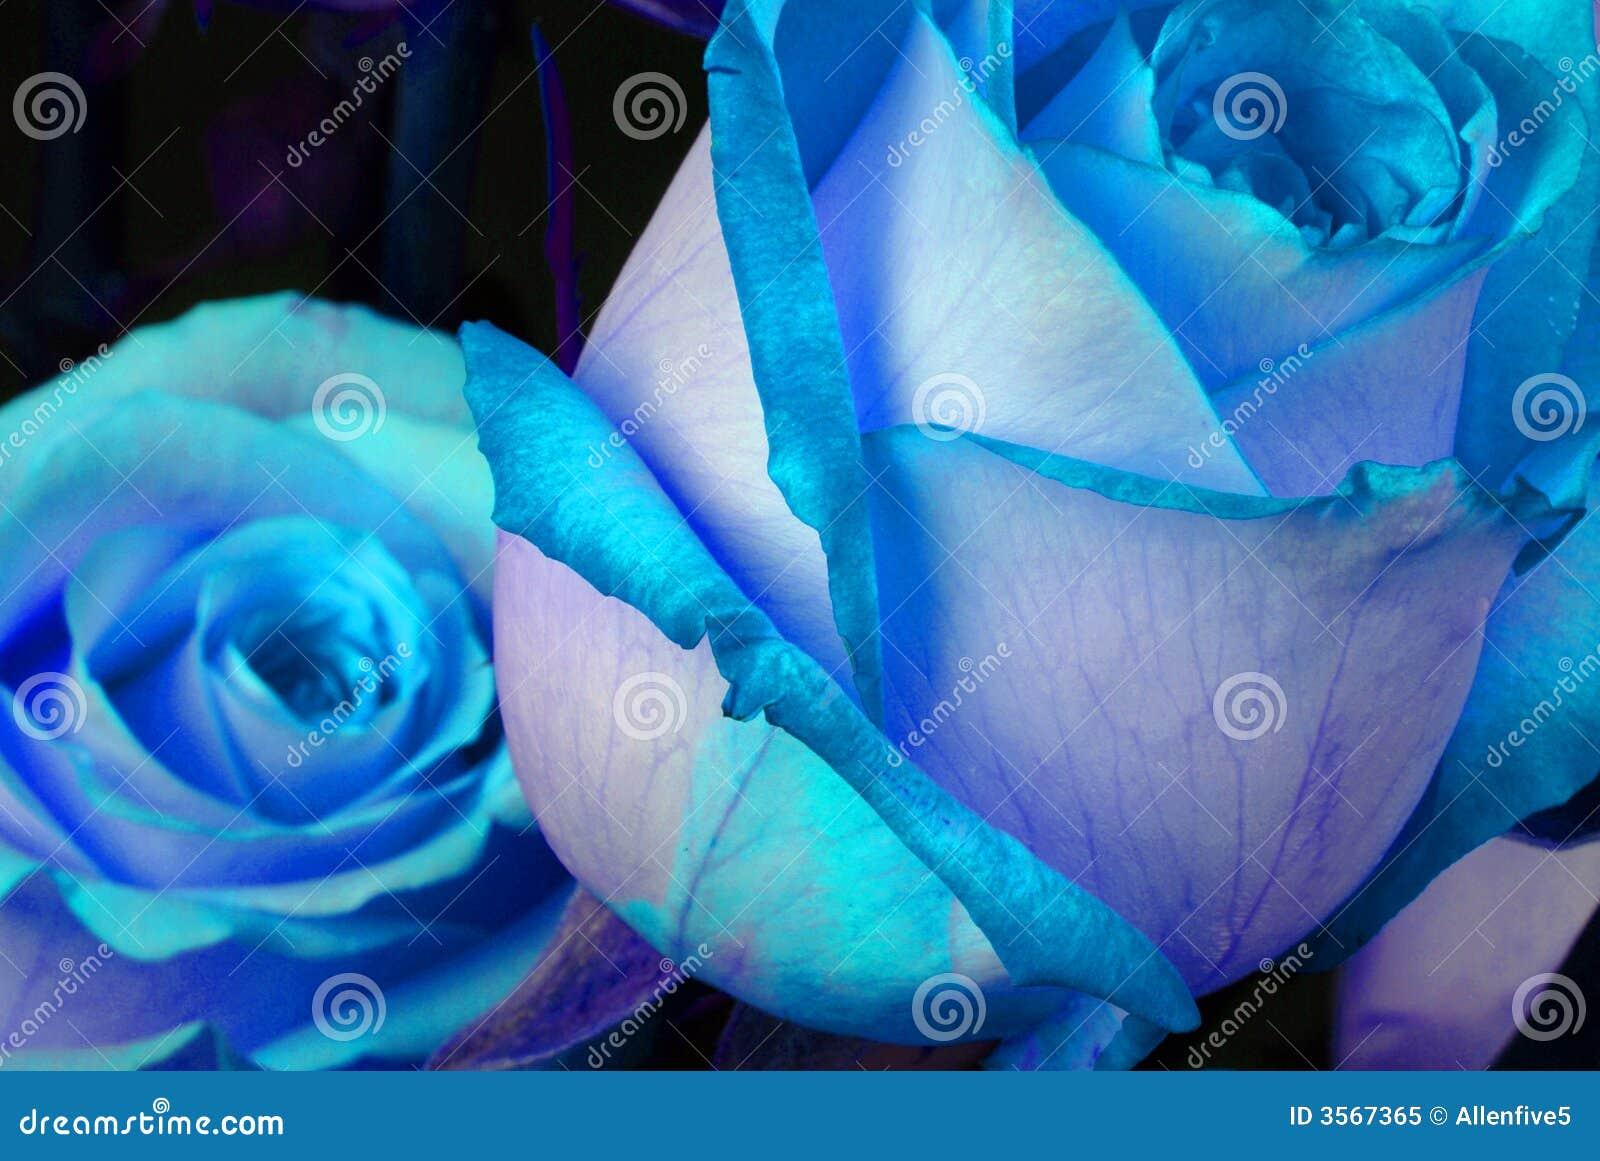 Blue Roses Stock Image Image Of Petal Macro Abstract 3567365